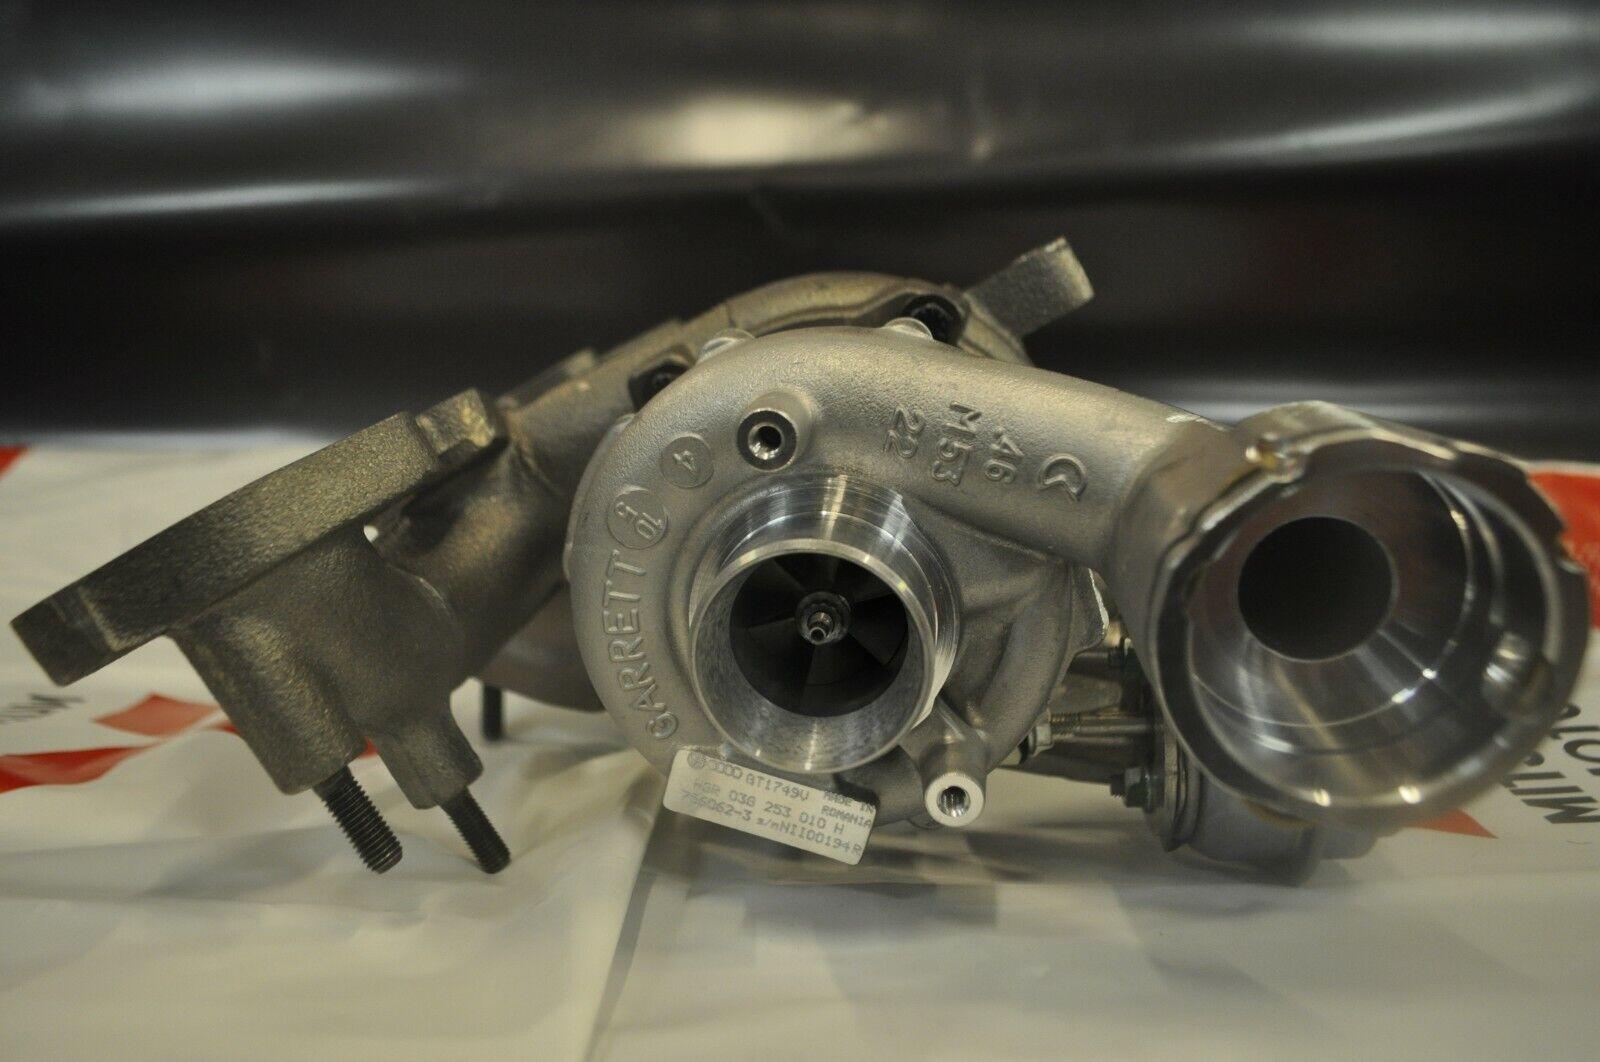 Düsenring vtg géométrie turbocompresseur 2.0 DI-D MITSUBISHI nozzle ring Garrett